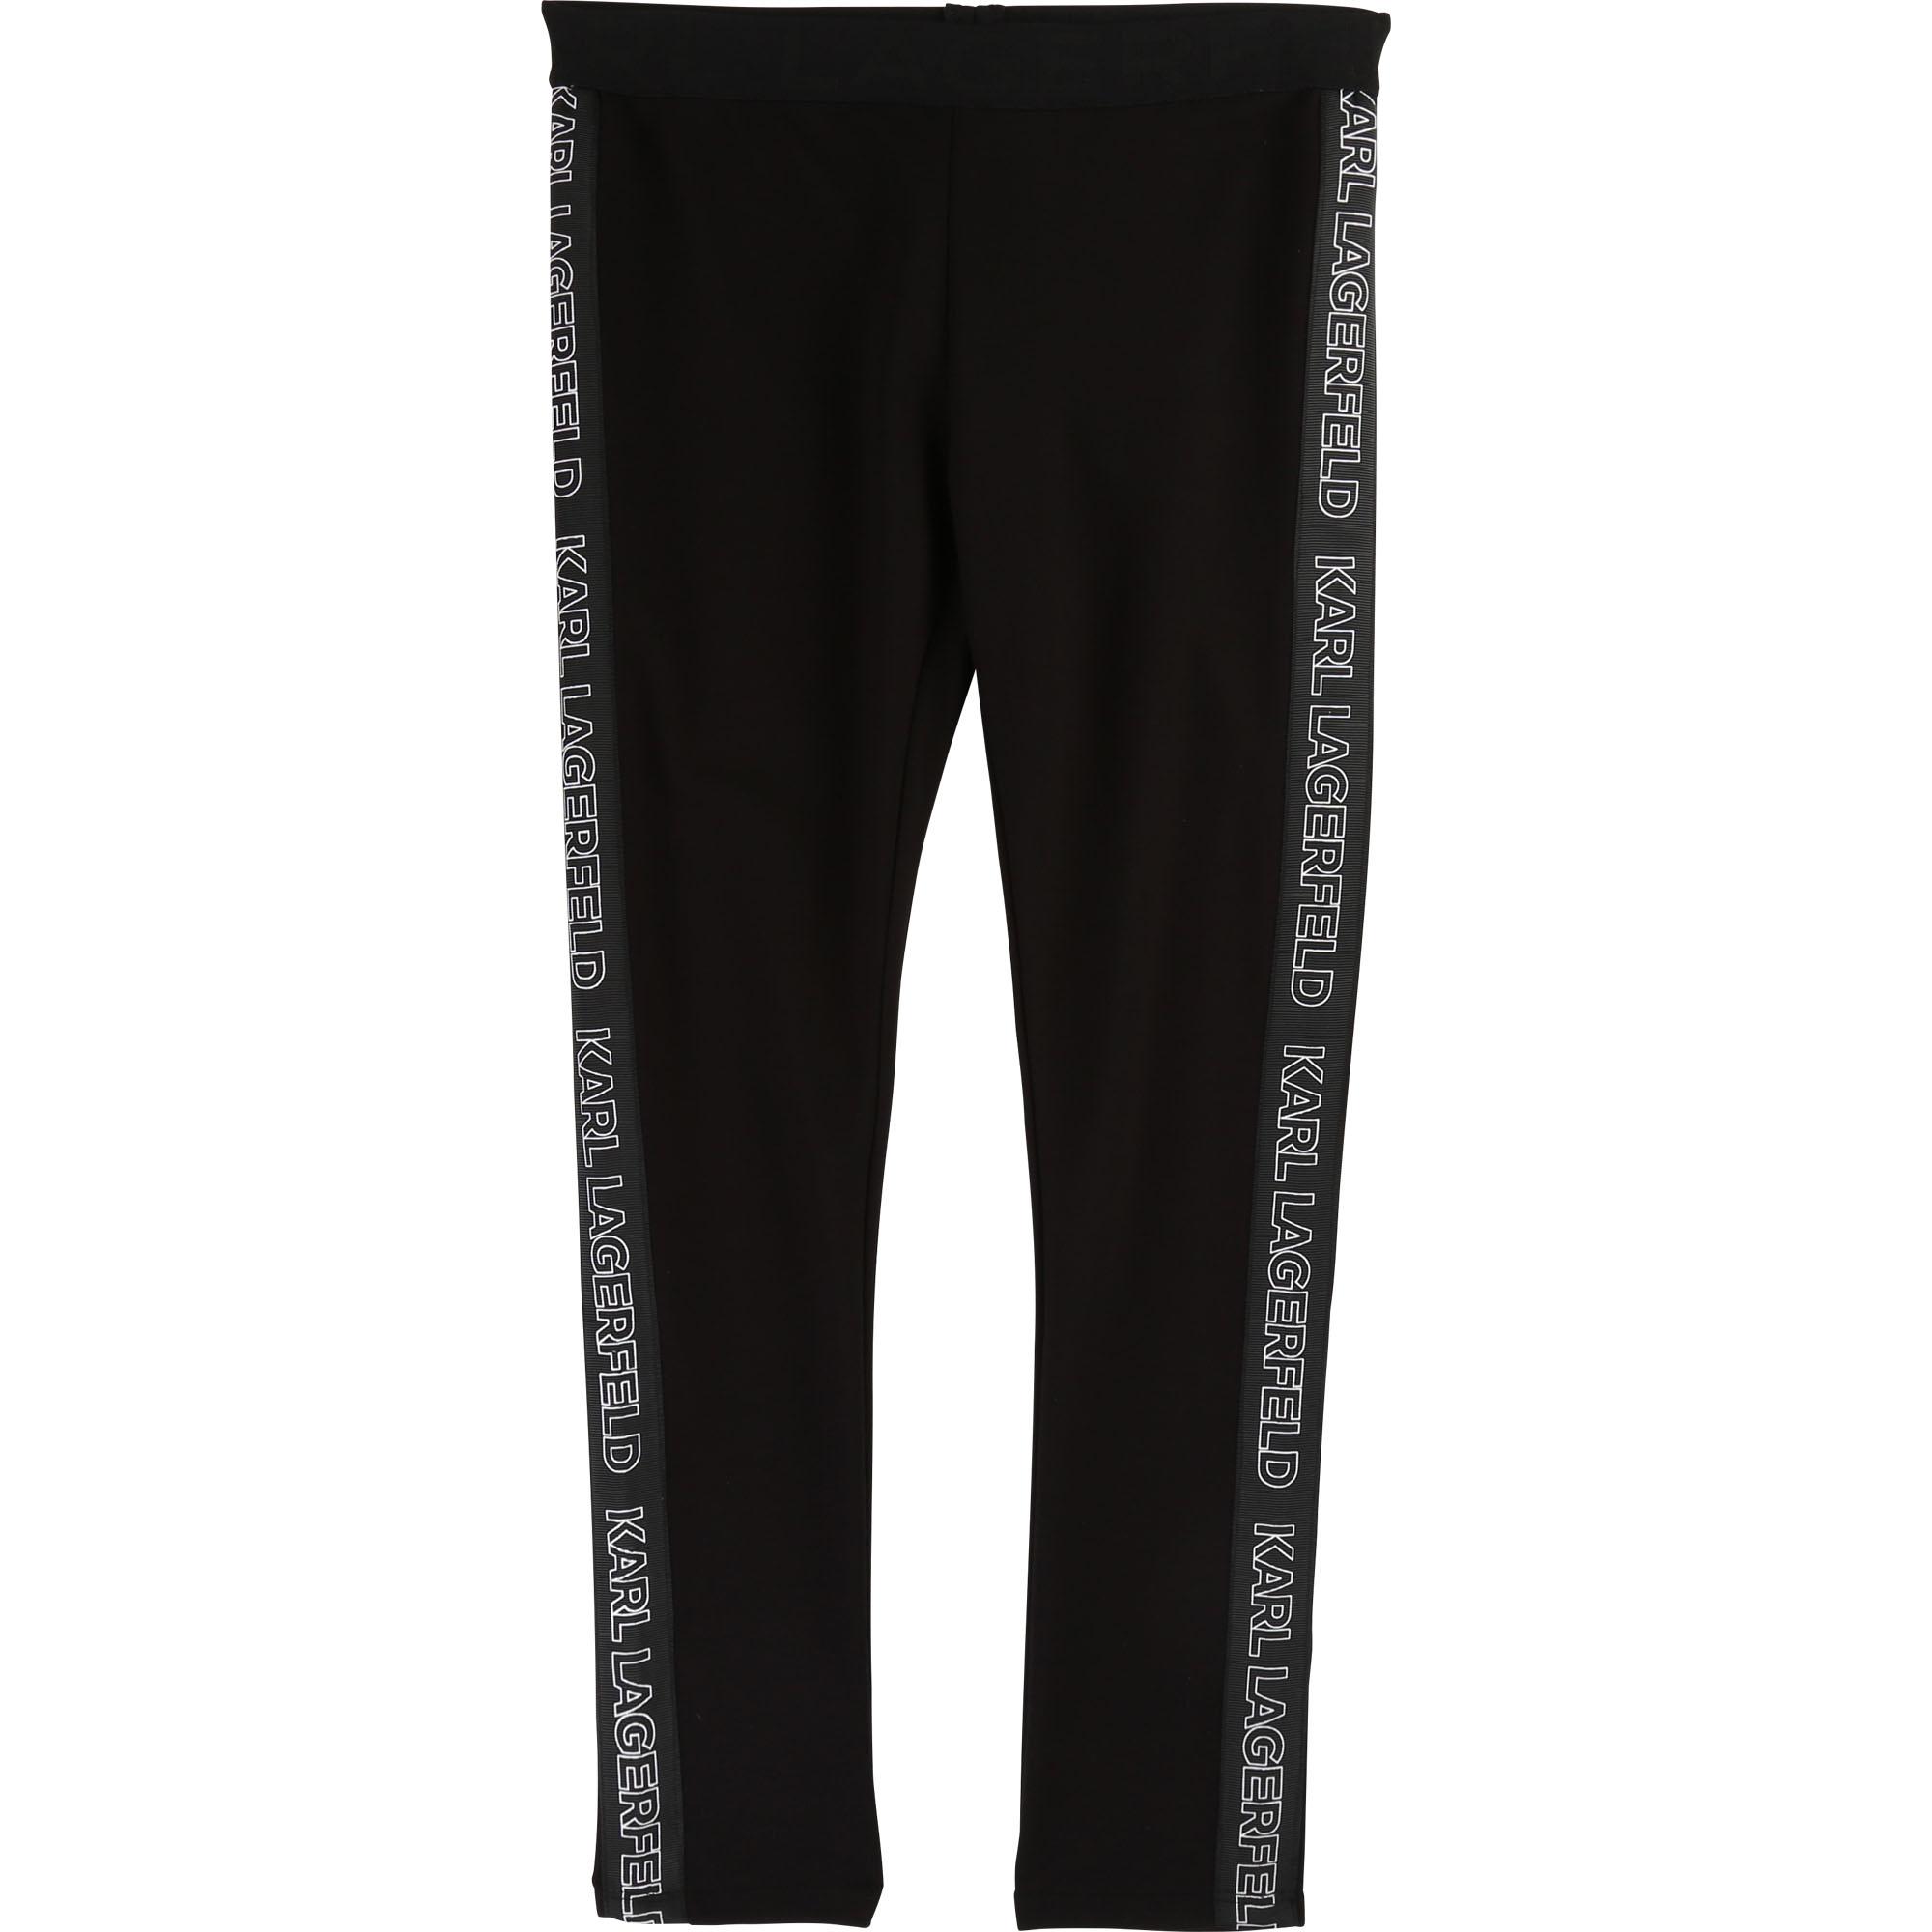 Karl Lagerfeld Leggings mit Track Stripes - schwarz